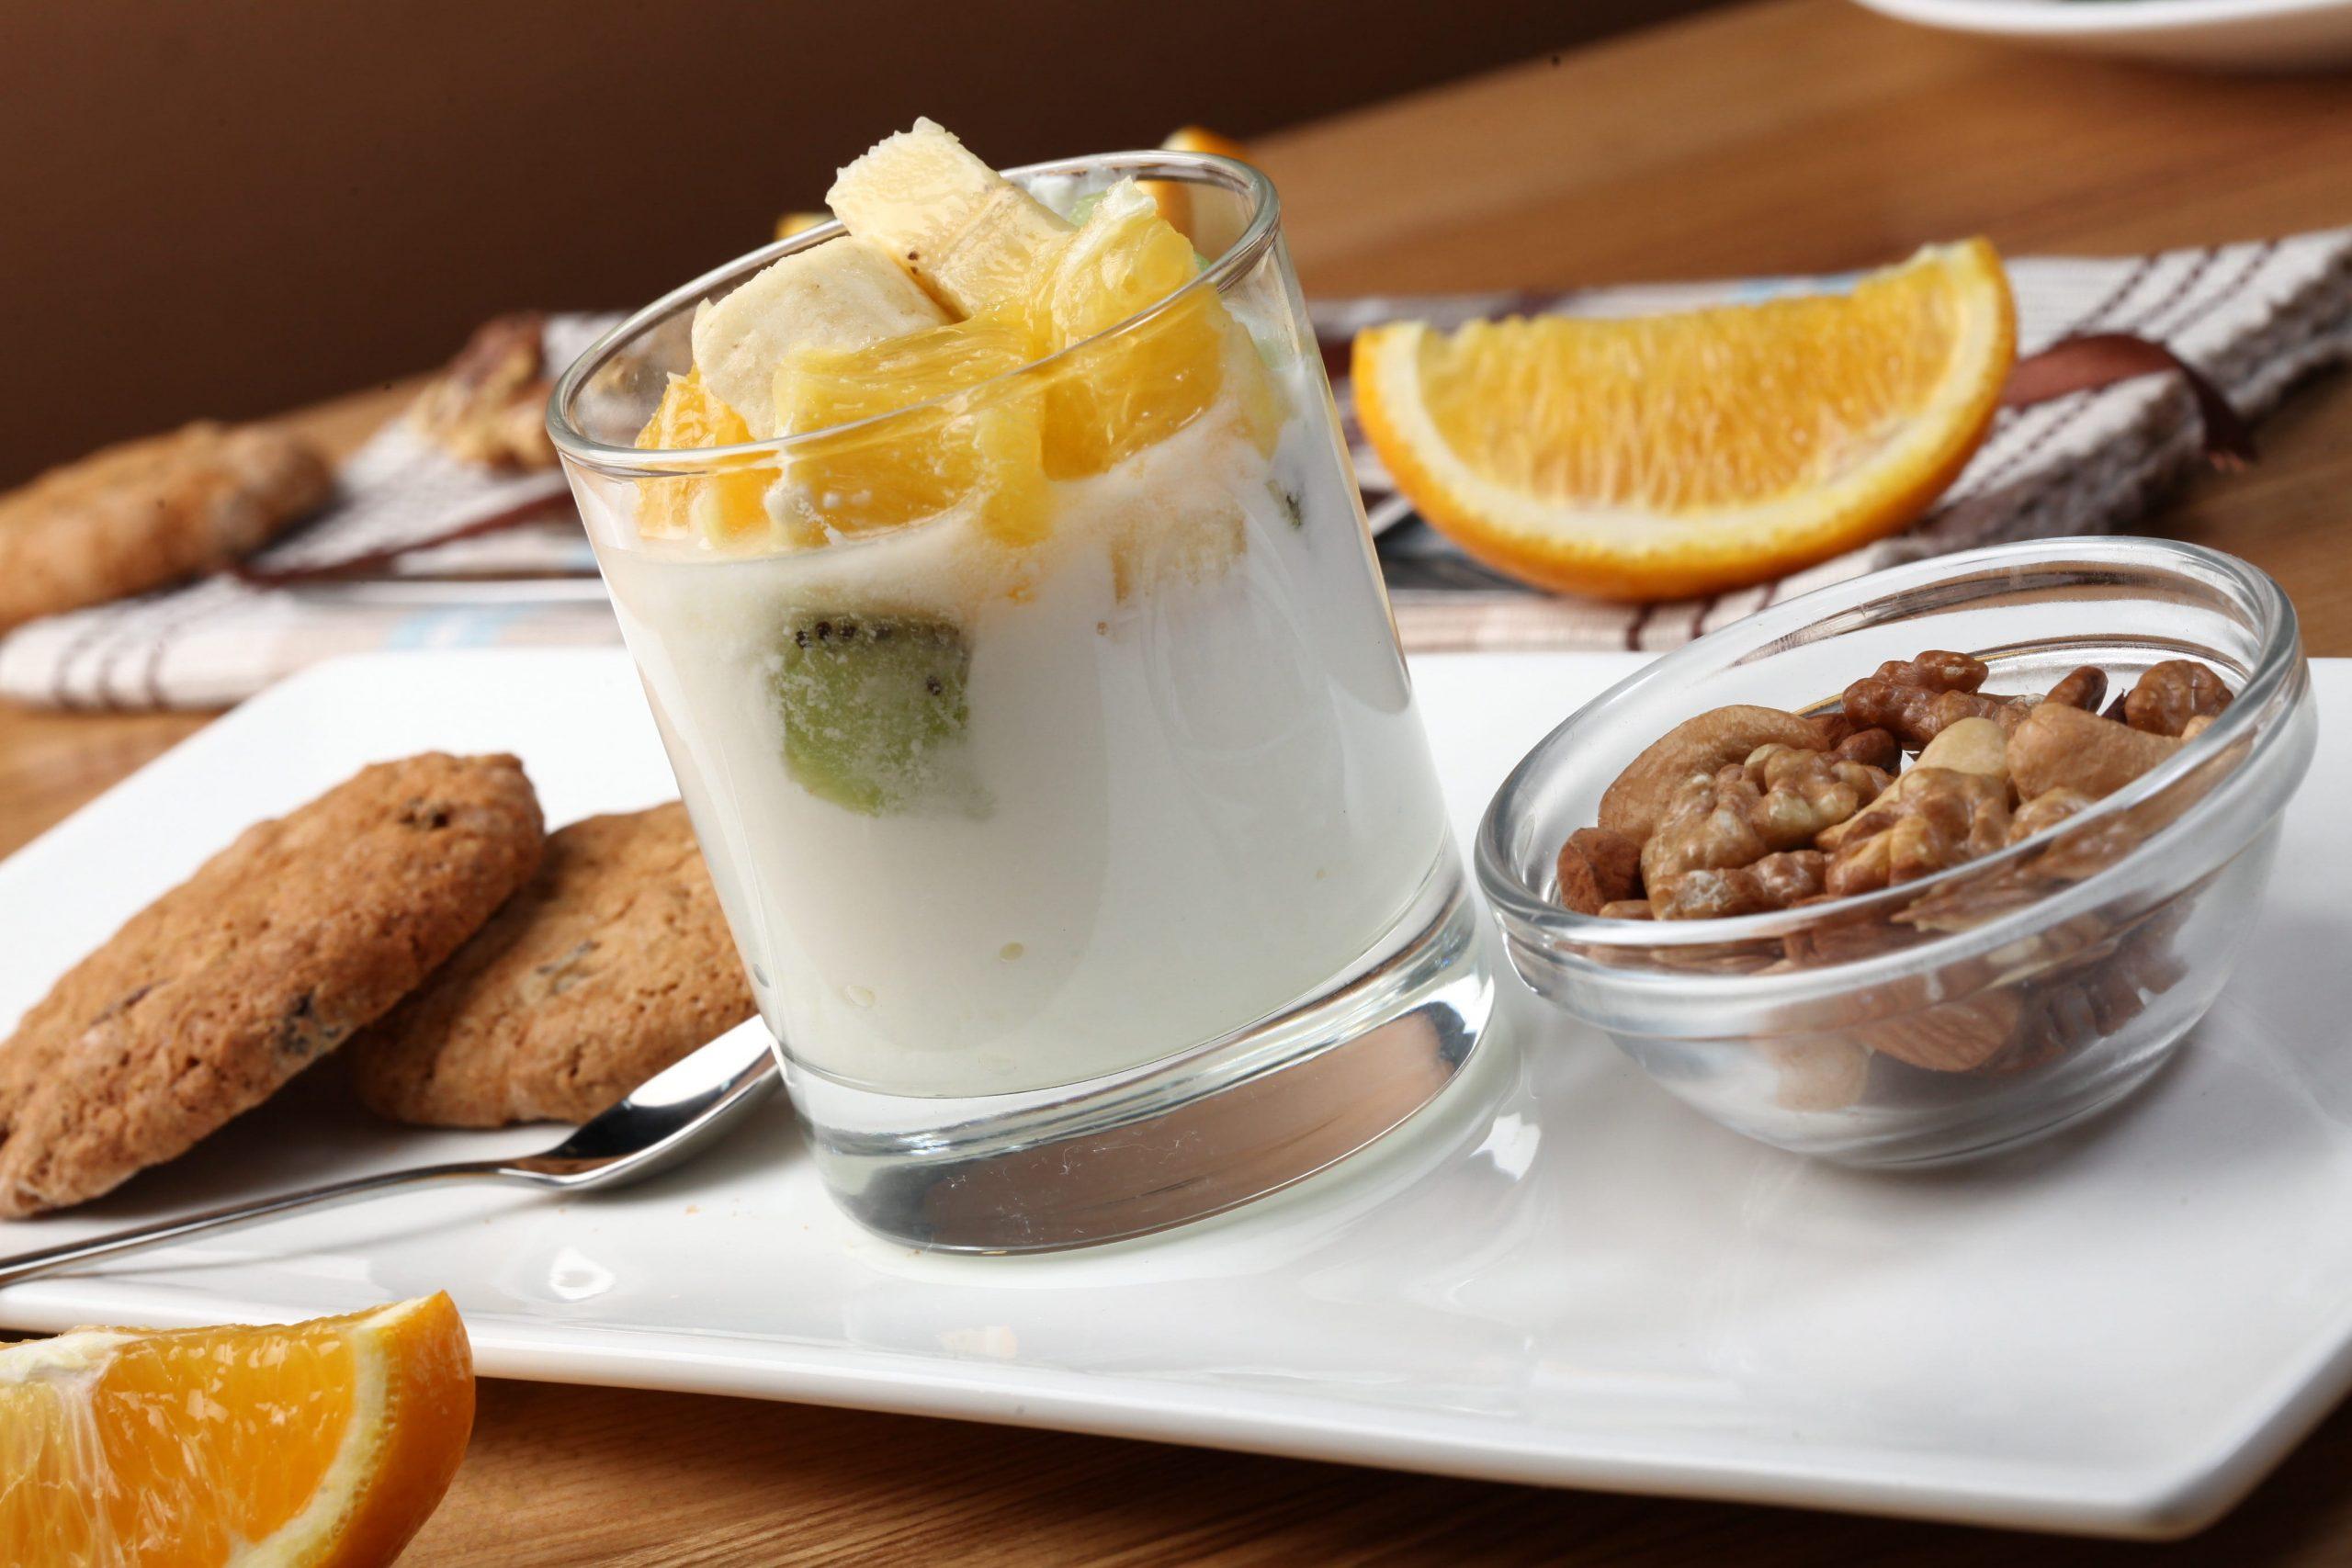 Desayuno con yogurt